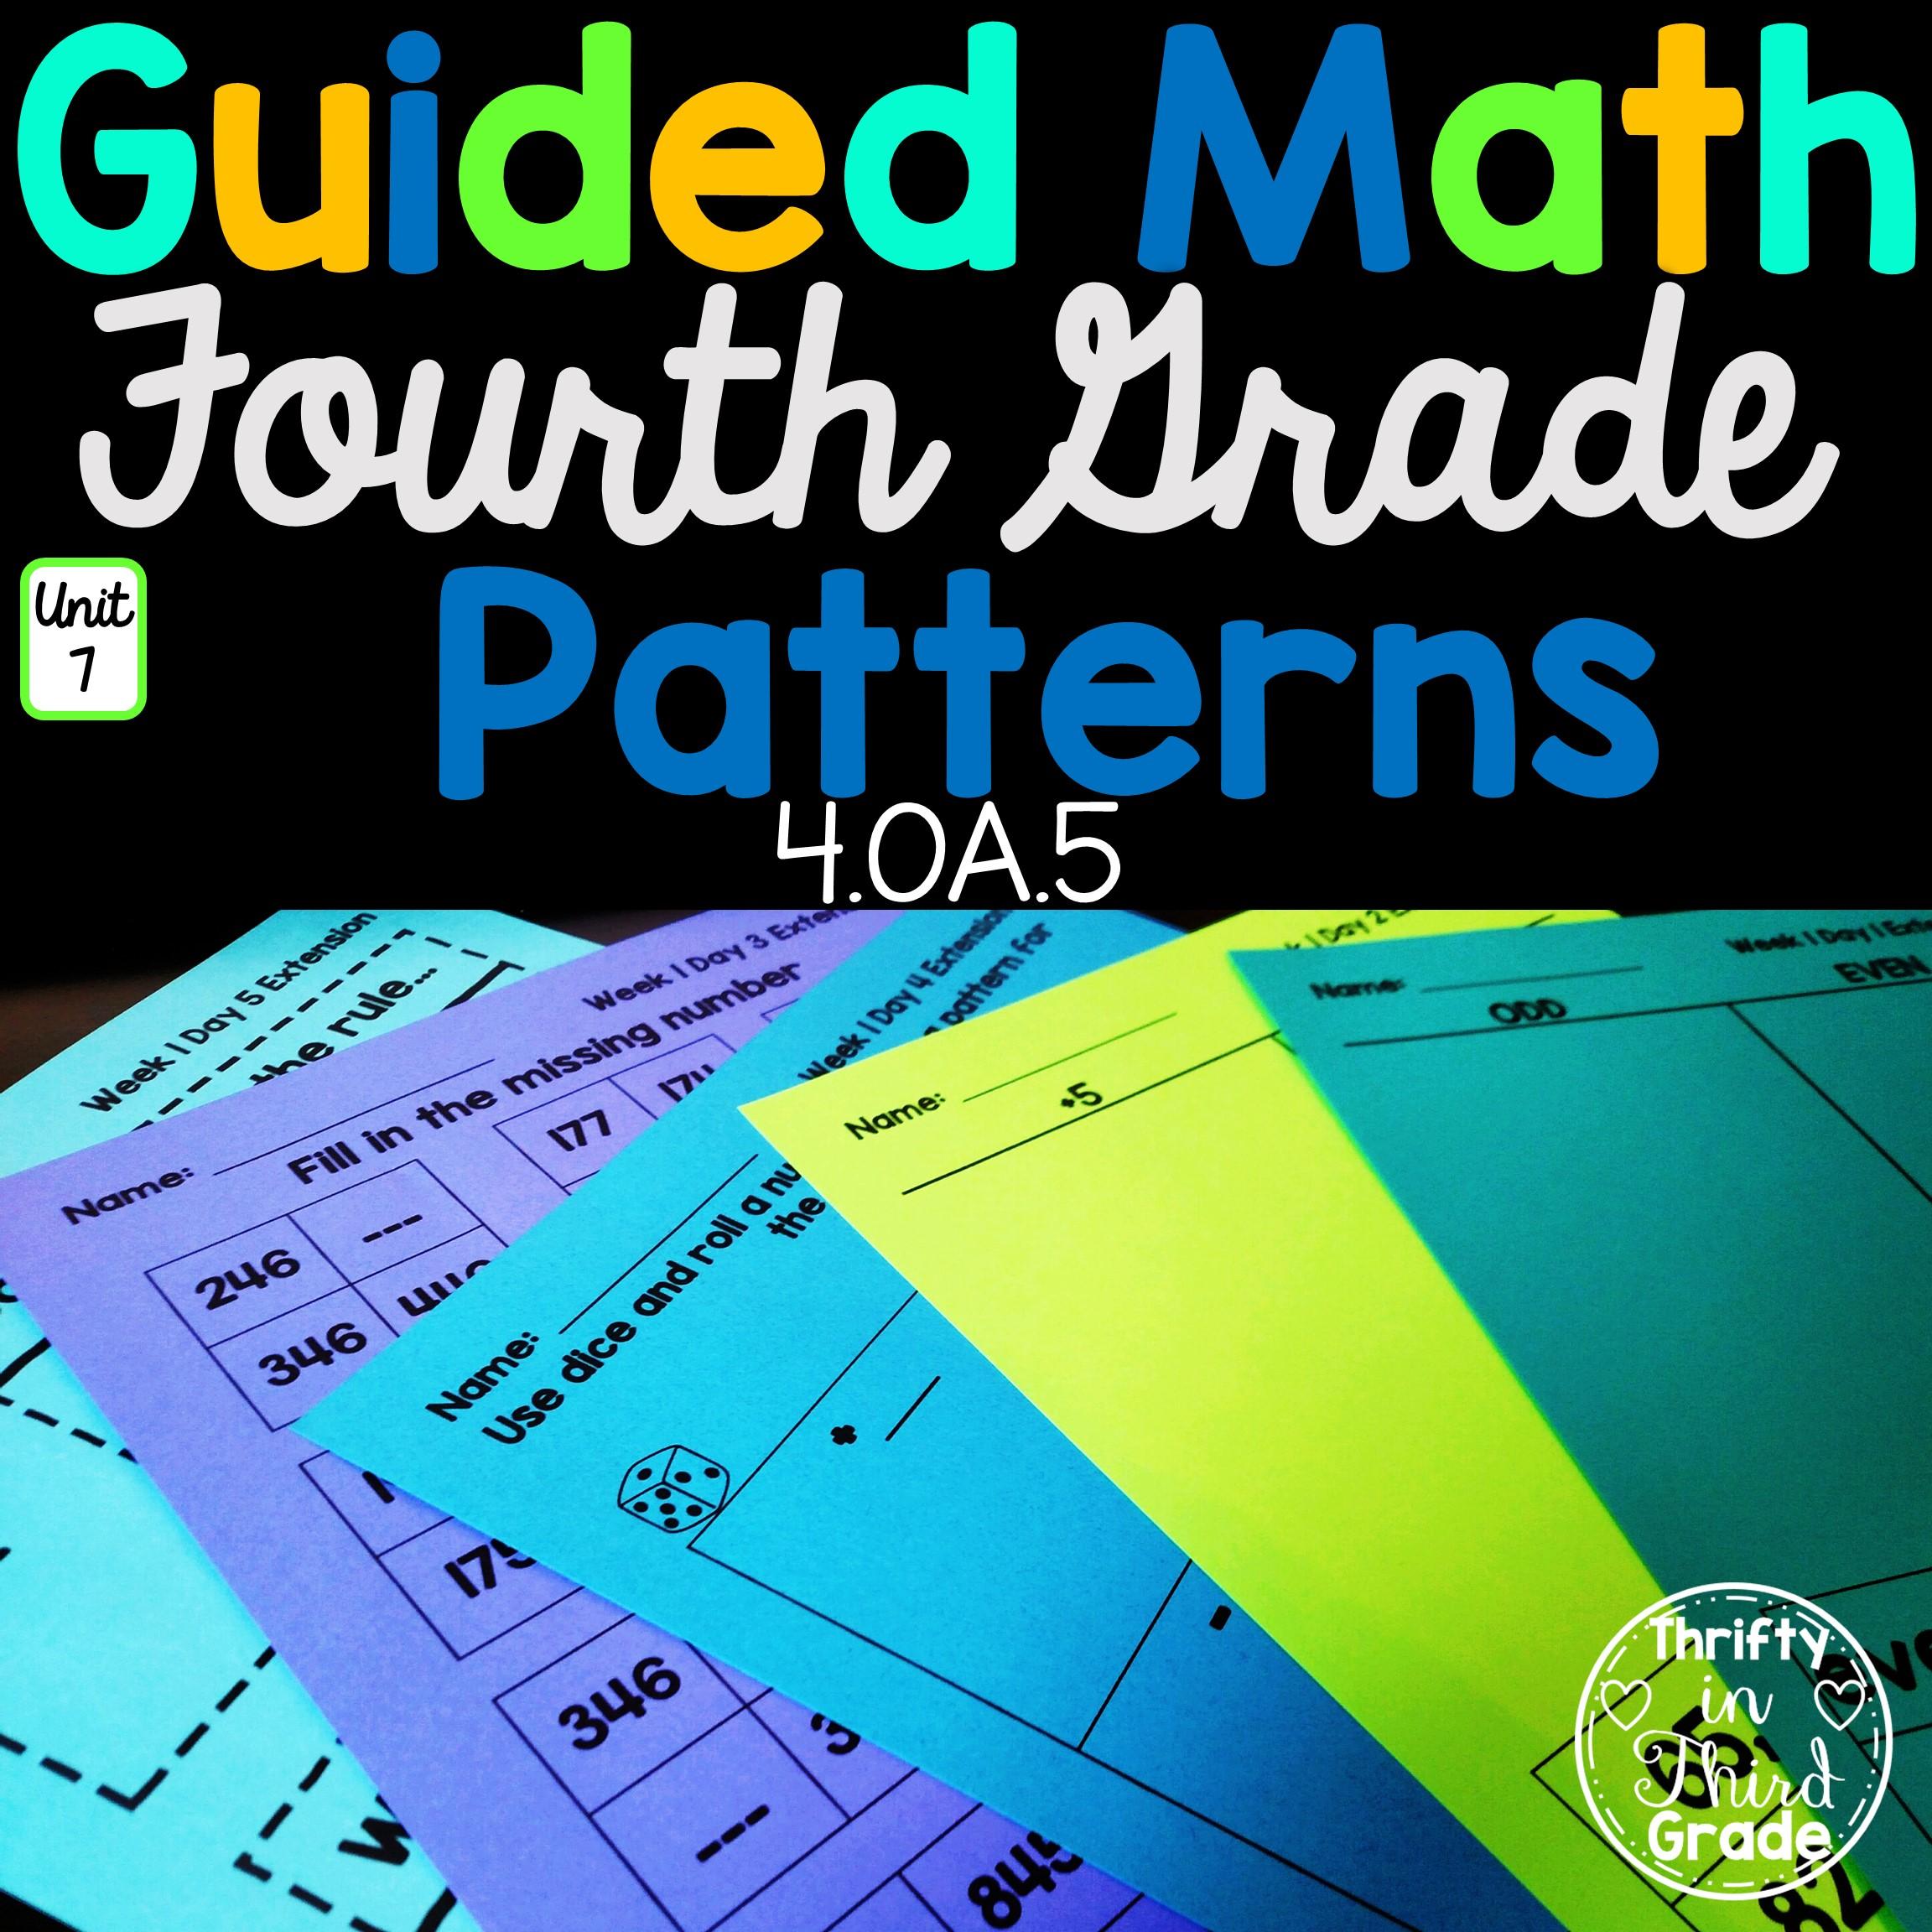 4th Grade Guided Math Unit 7 Patterns